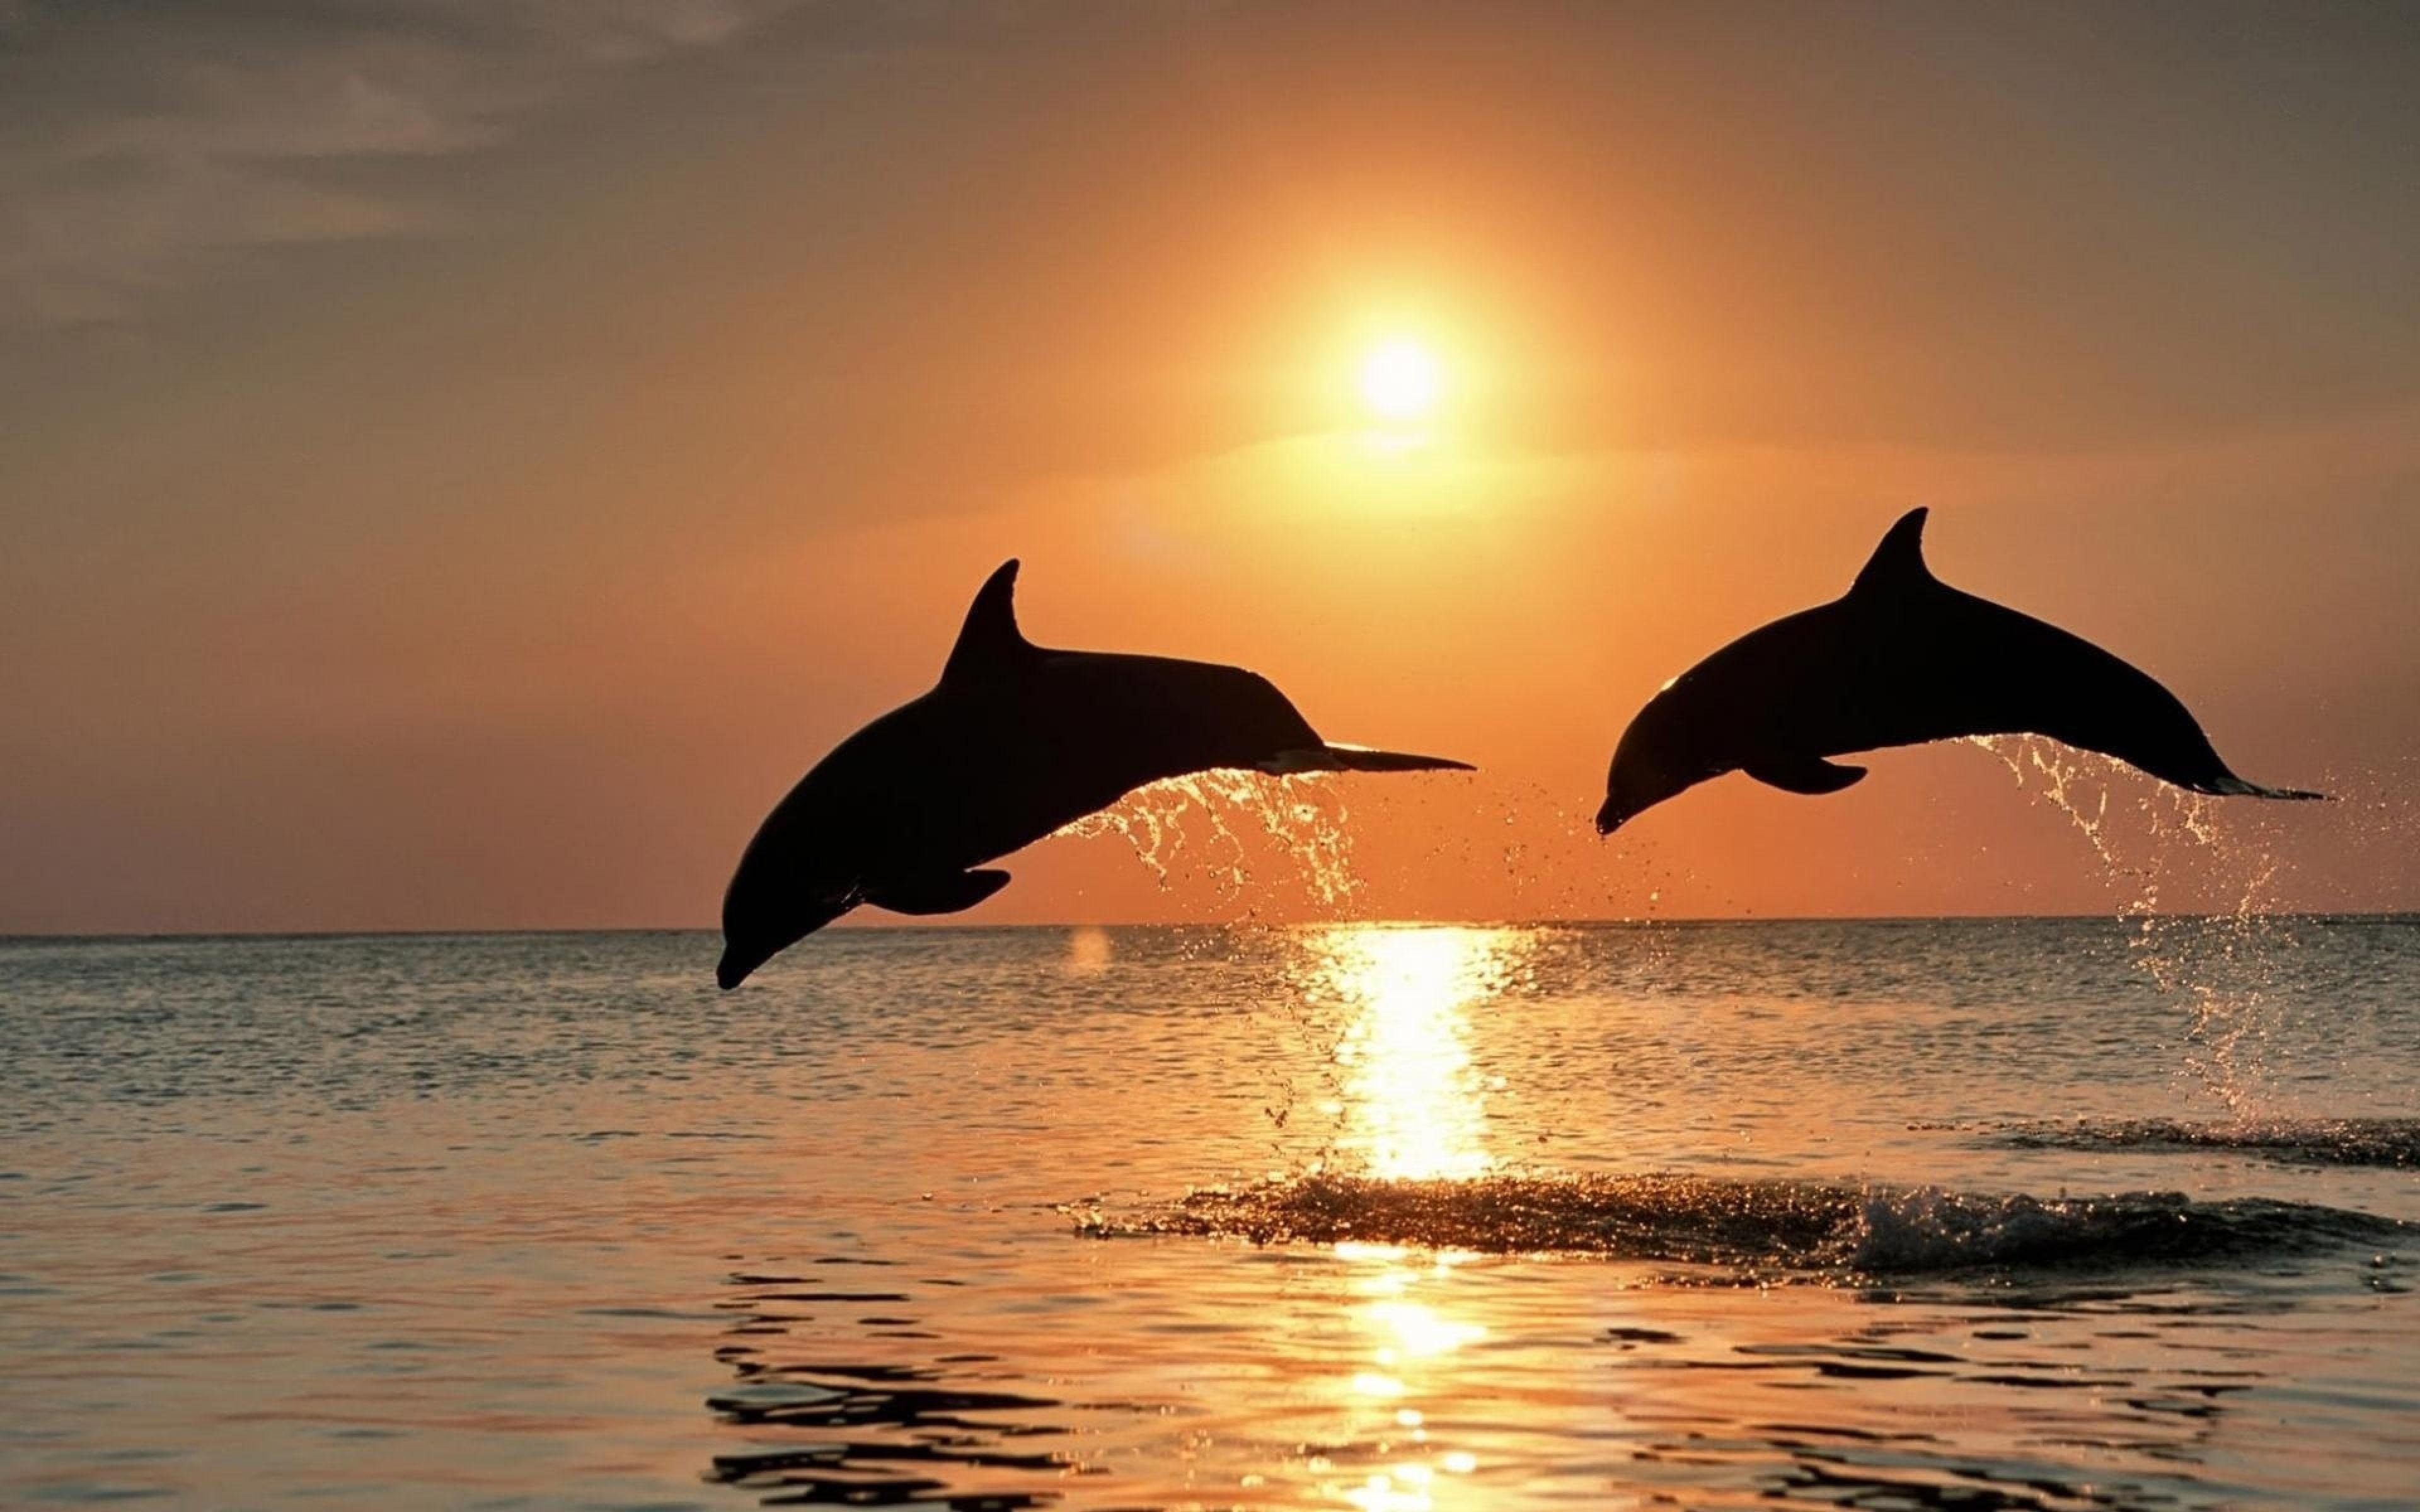 Bottlenose dolphins Widescreen for desktop